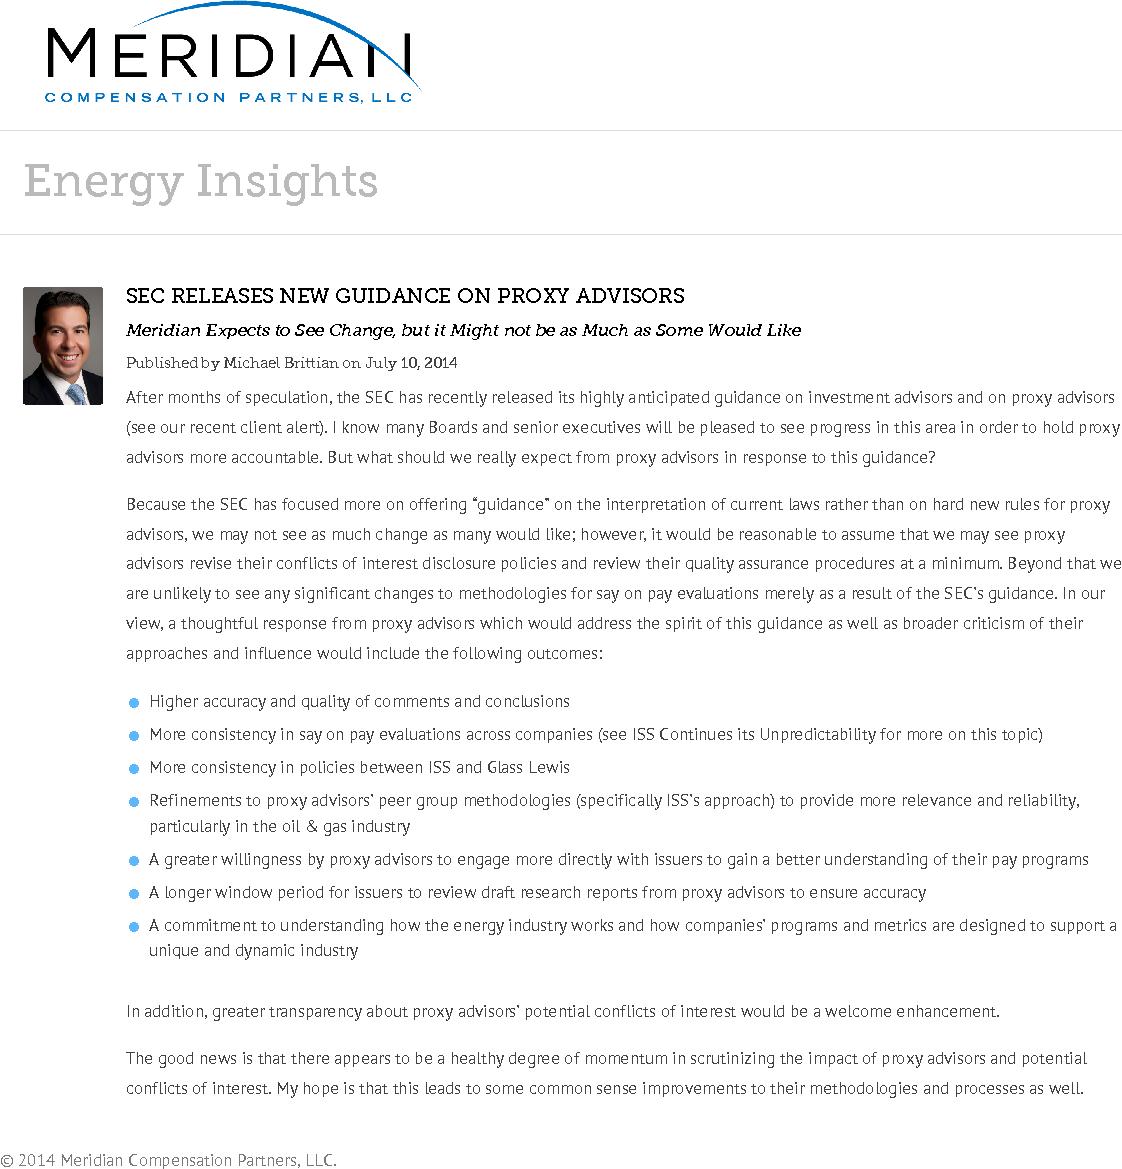 SEC Releases New Guidance on Proxy Advisors (PDF)